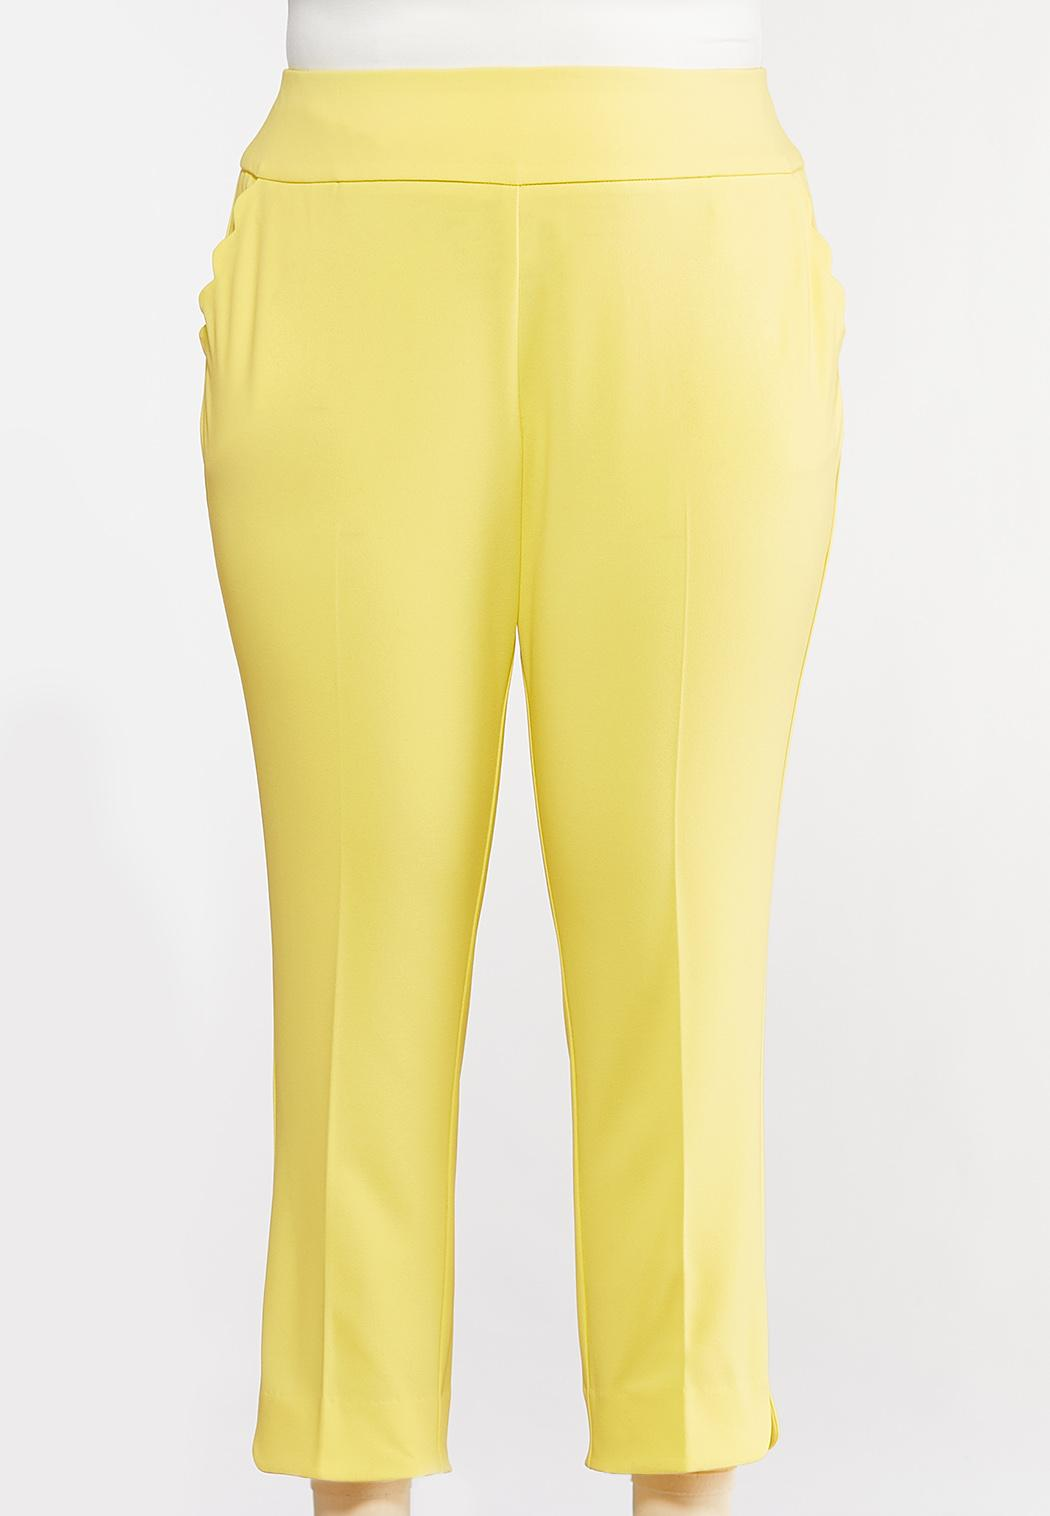 Plus Petite Yellow Scalloped Pants